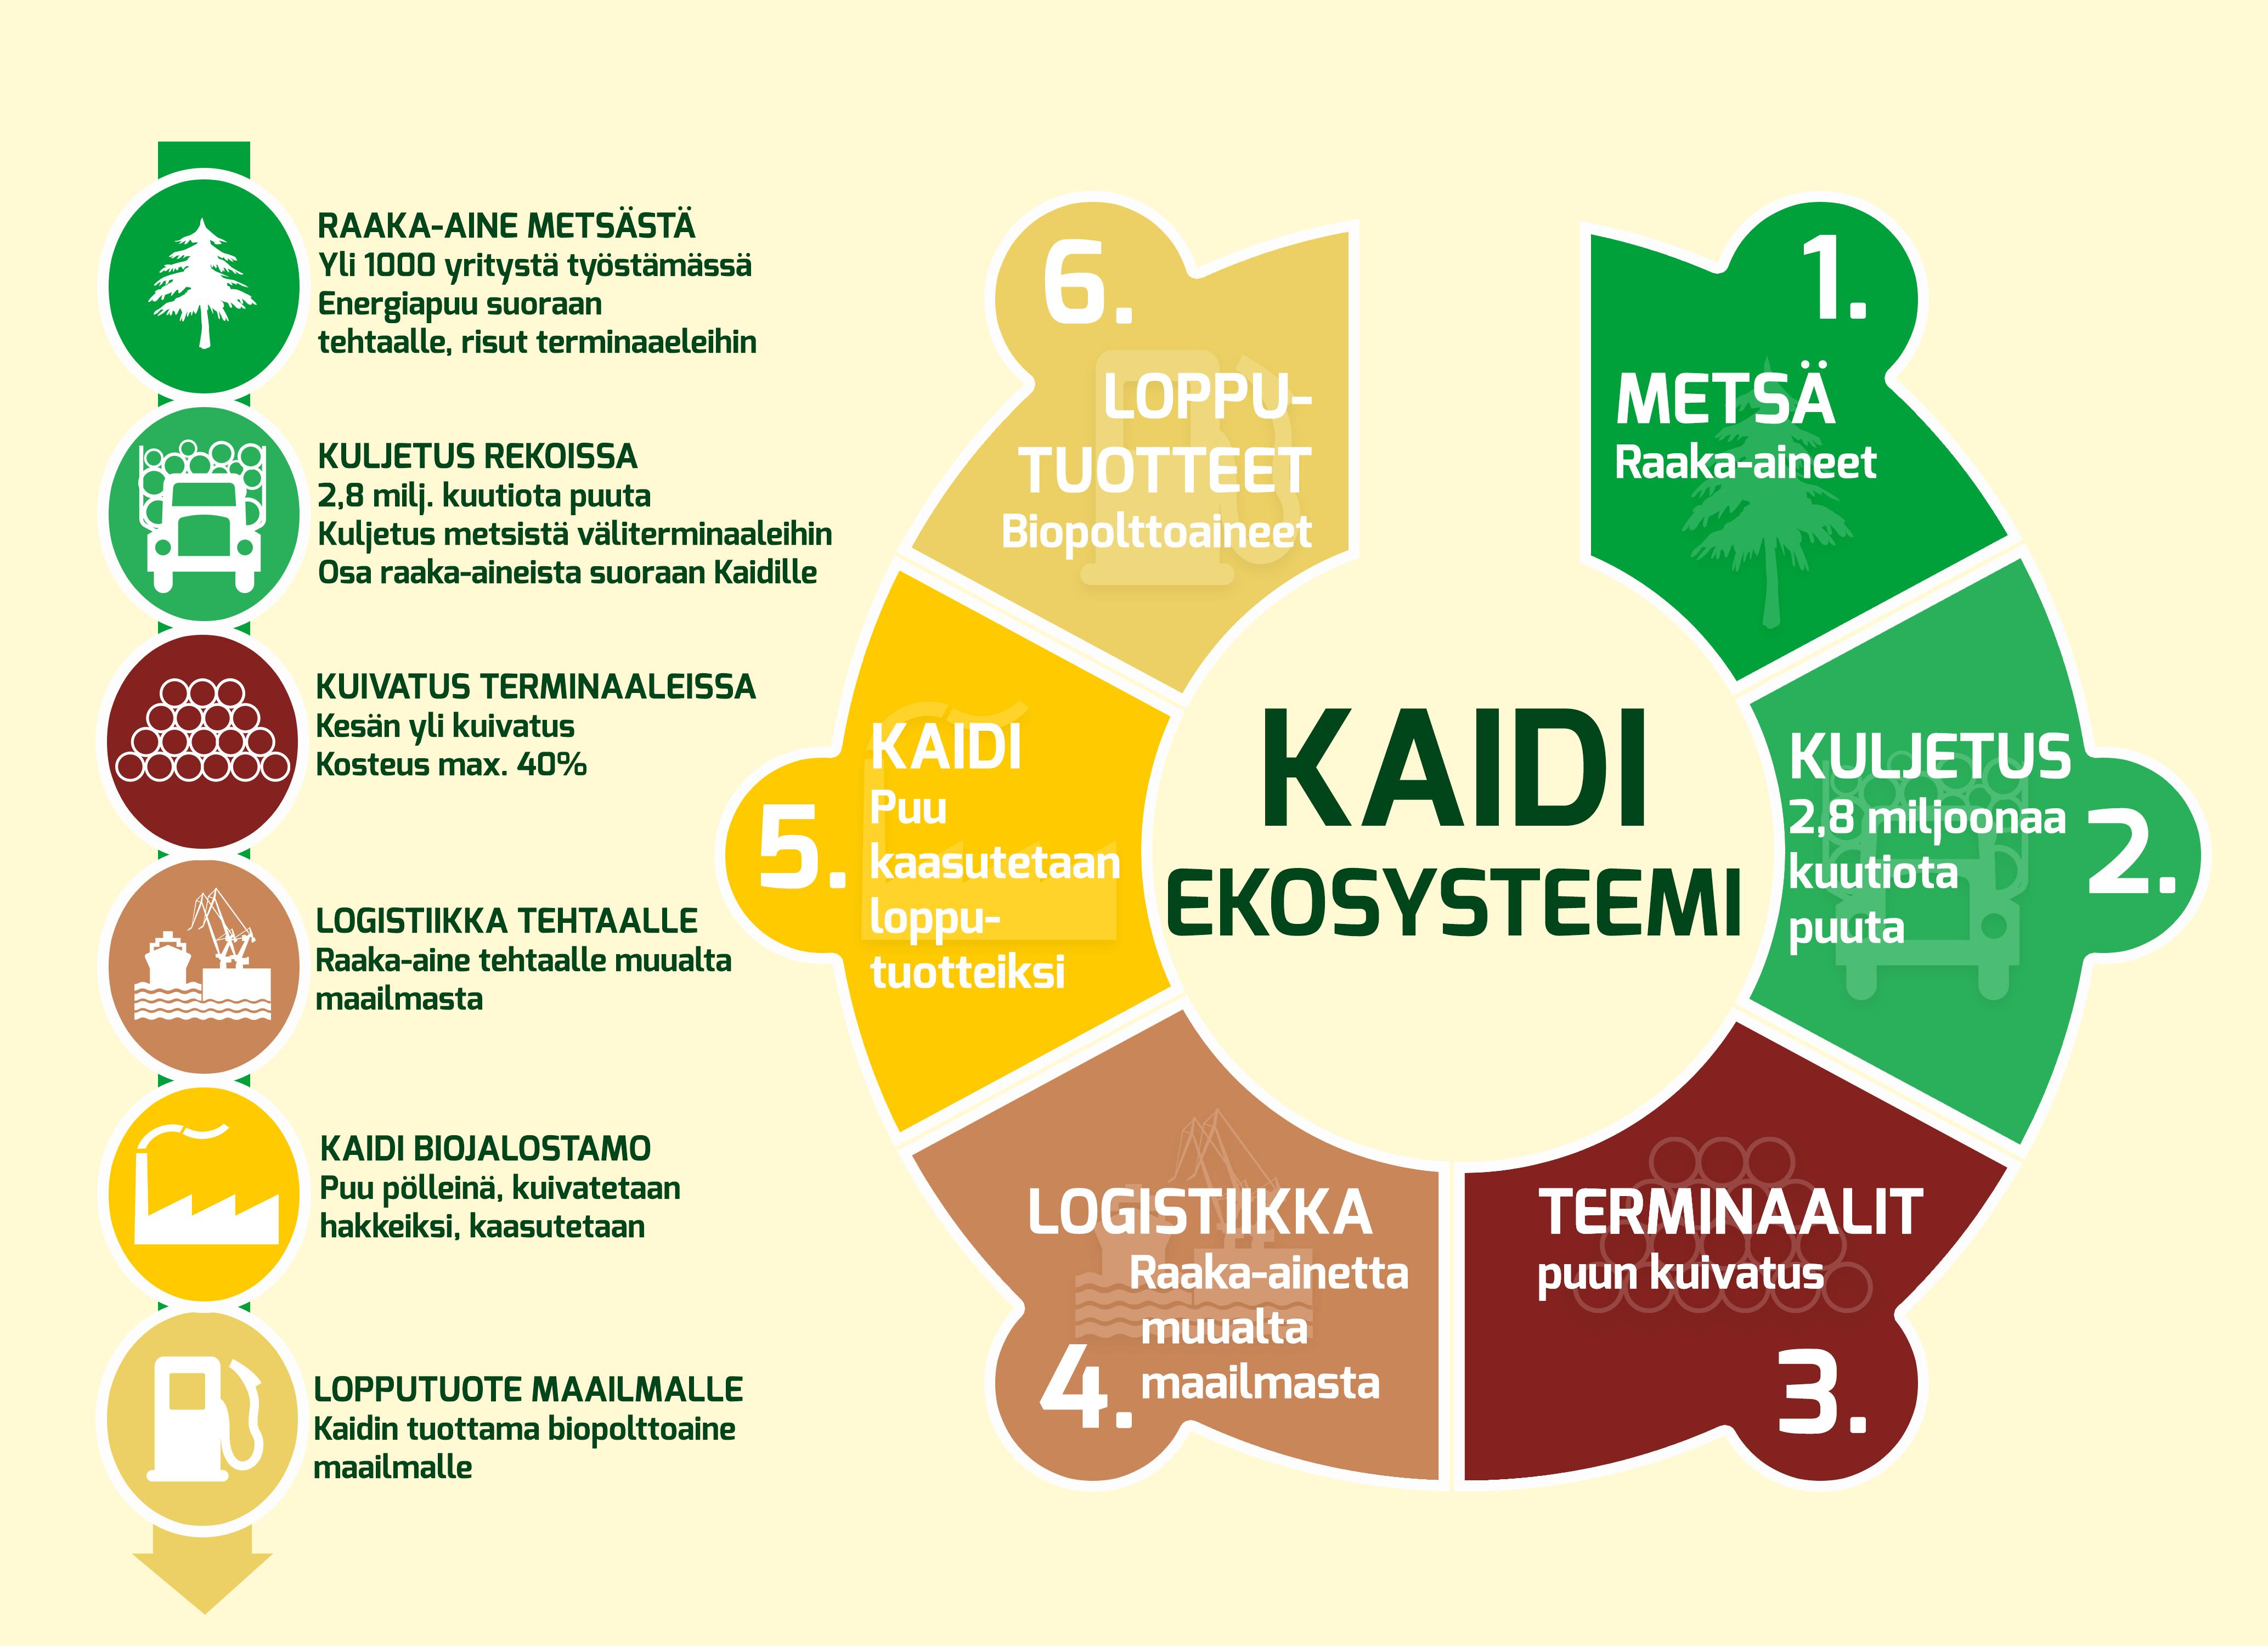 kaidi-ekosysteemi